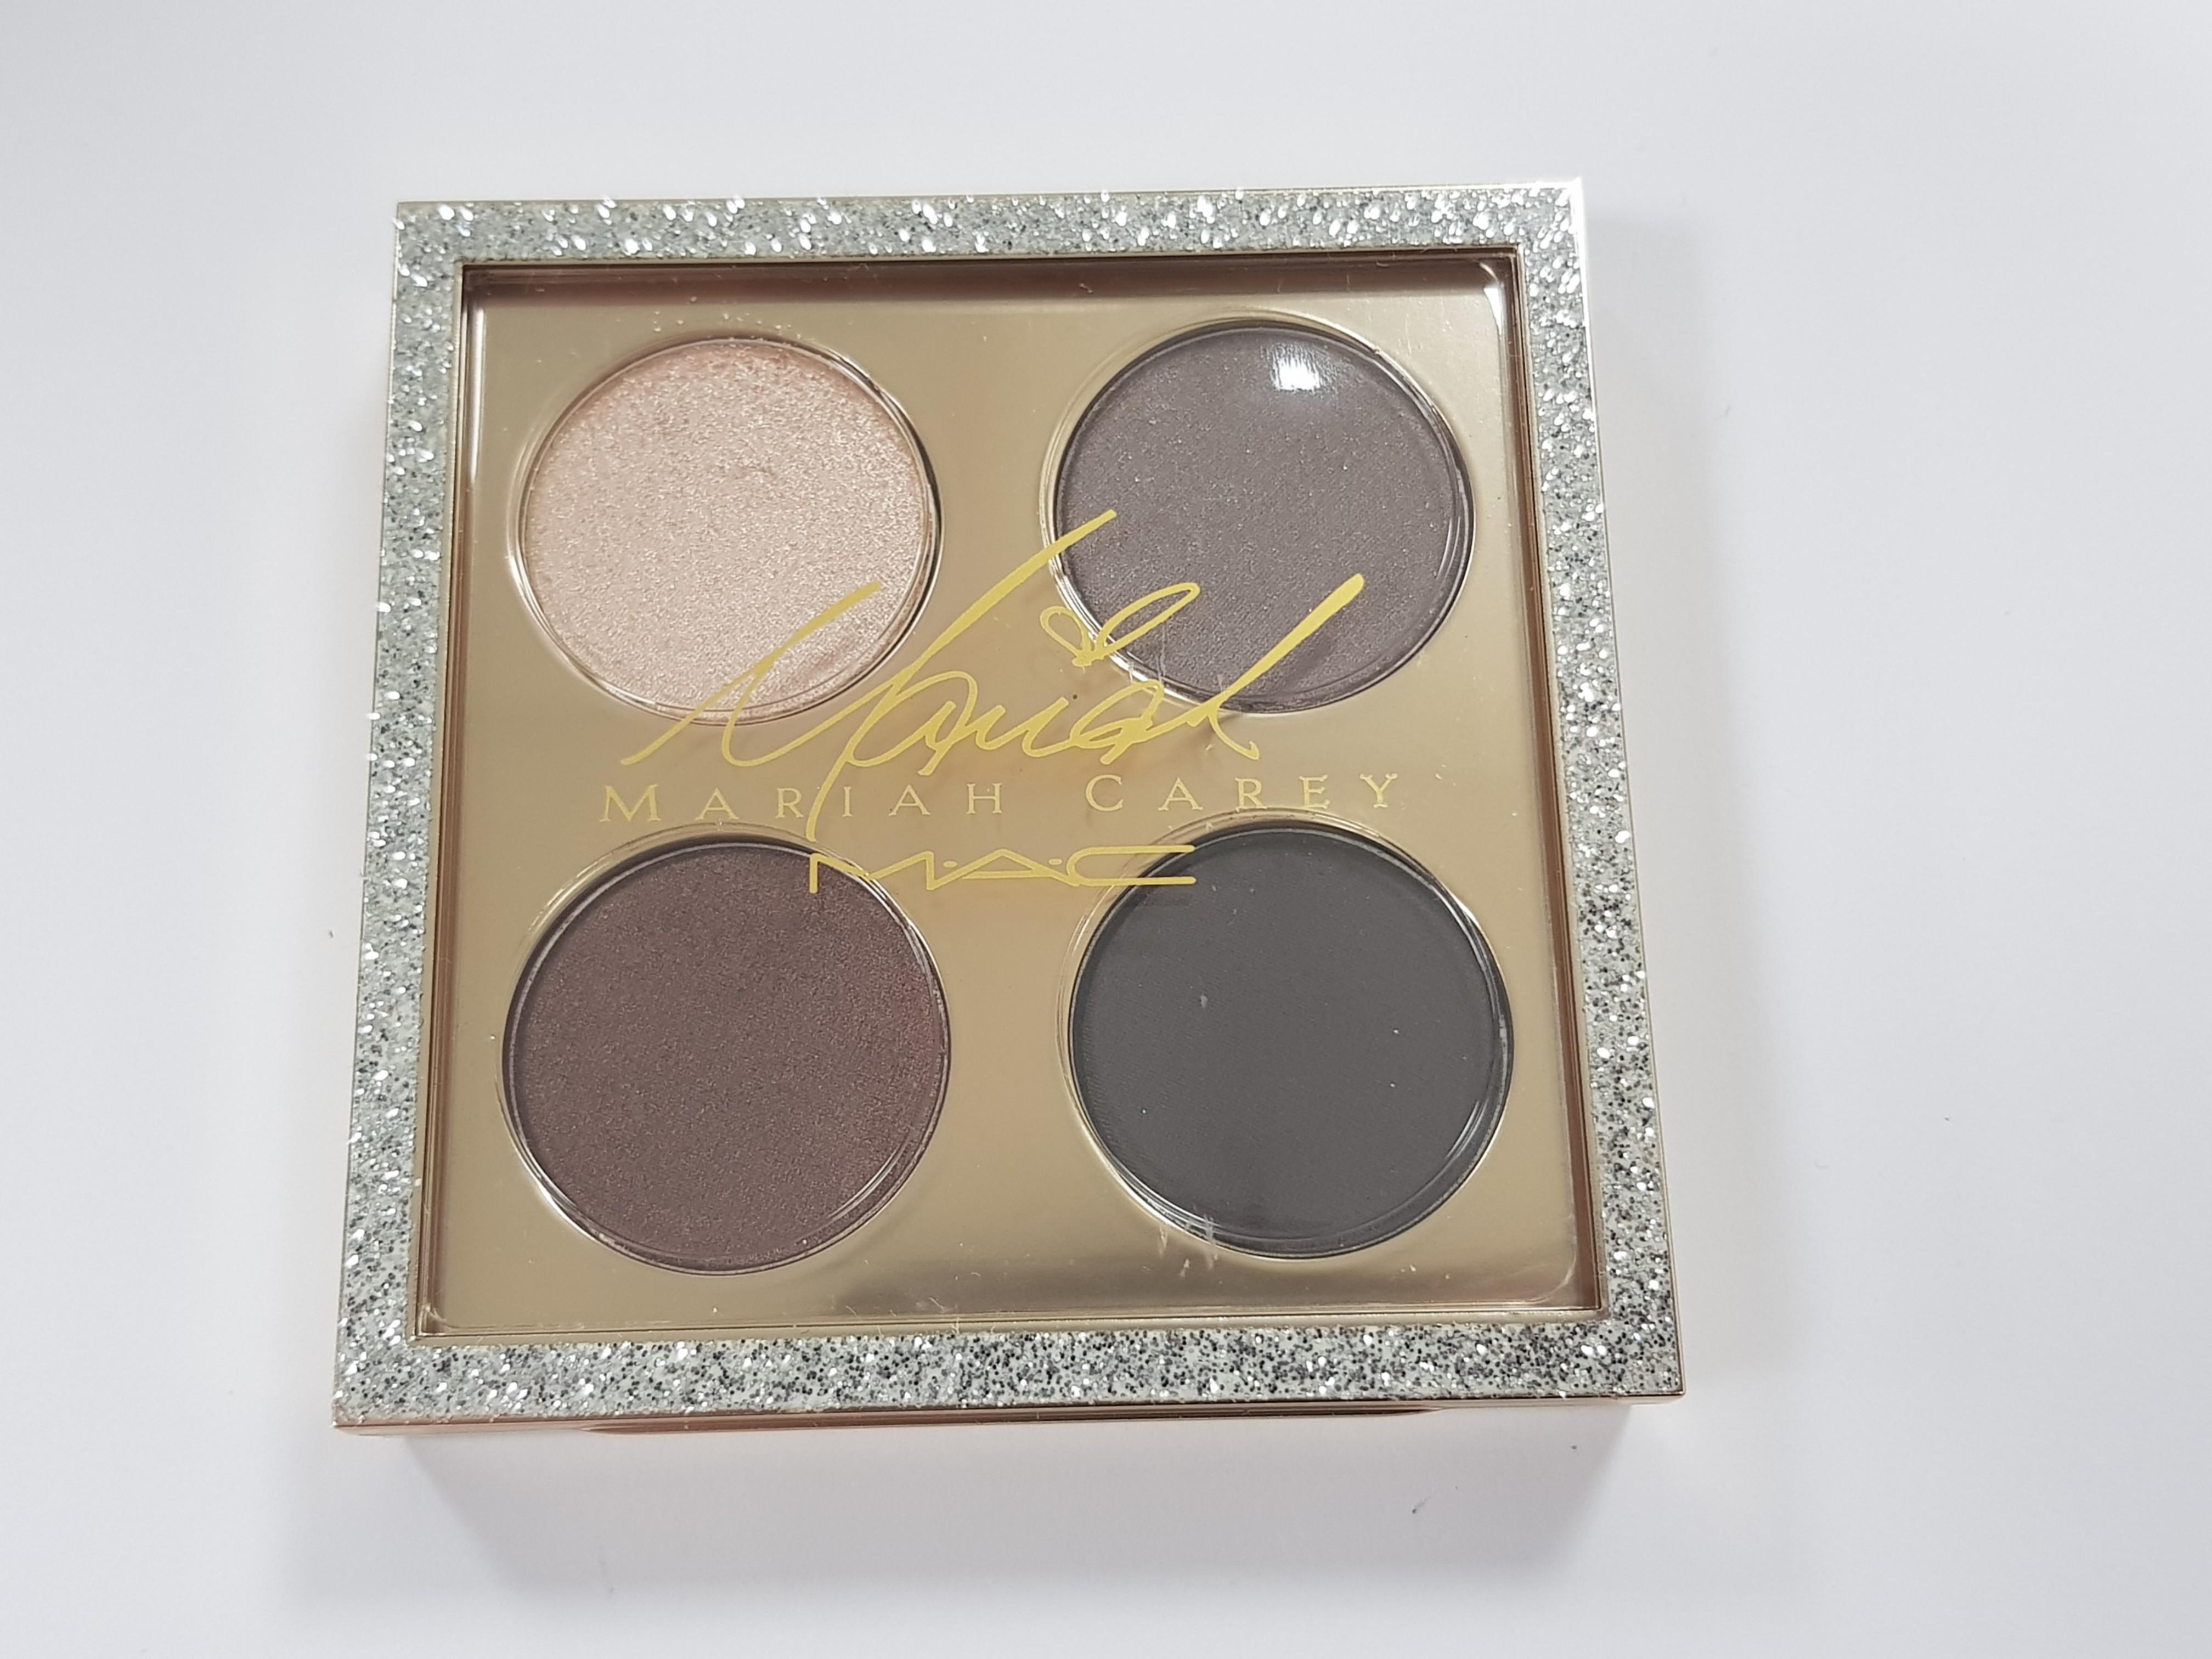 New! MAC Limited Edition Mariah Carey It's Everything Eyeshadow Quad Palette